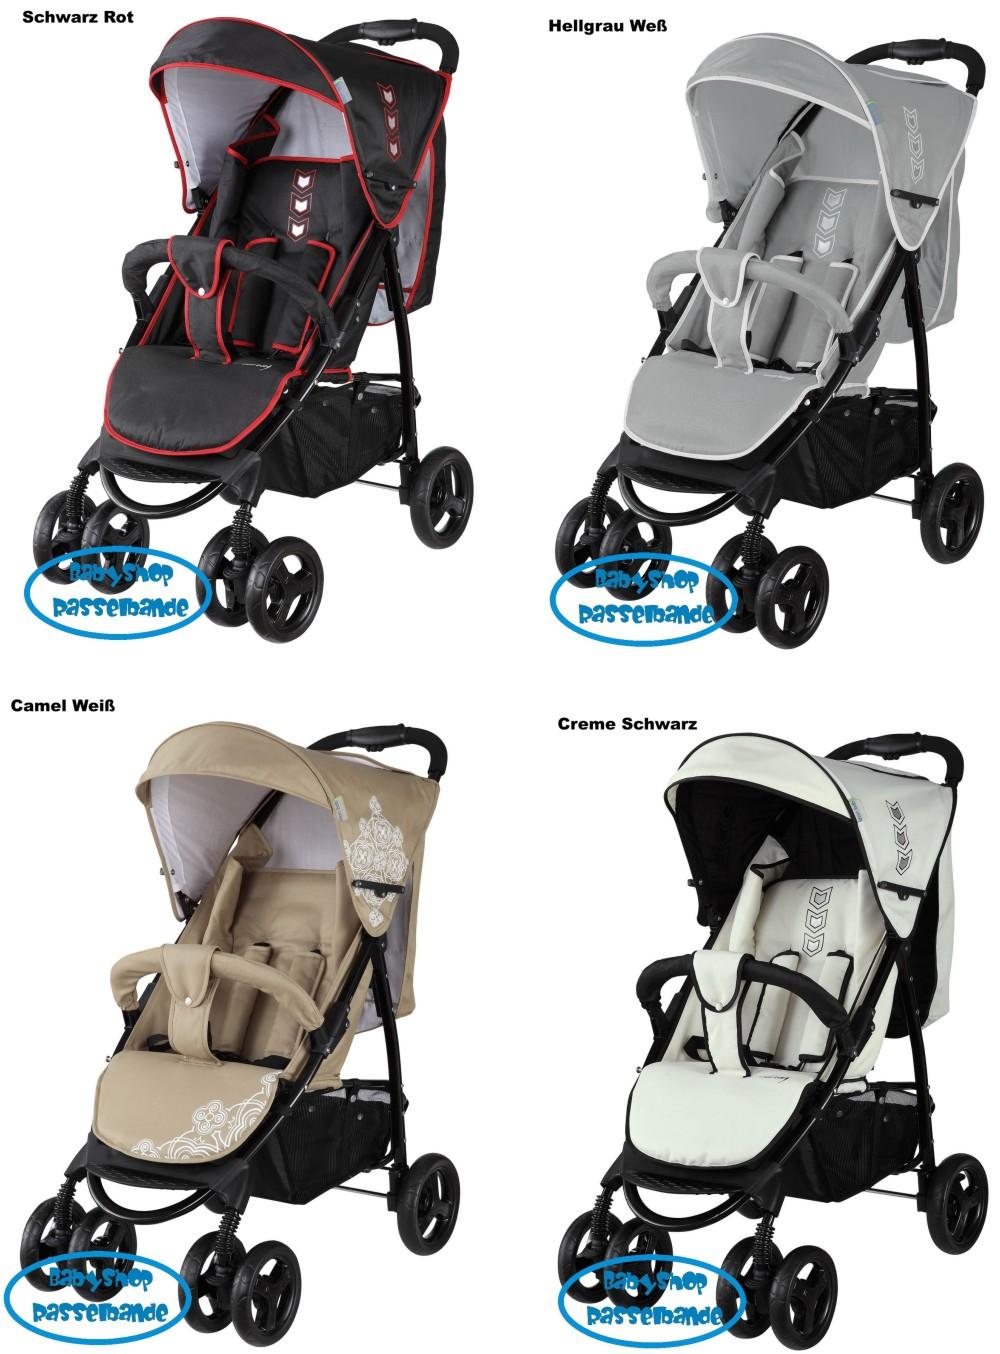 knorr baby buggy sportwagen streeter 2015 in verschiedenen farben ebay. Black Bedroom Furniture Sets. Home Design Ideas